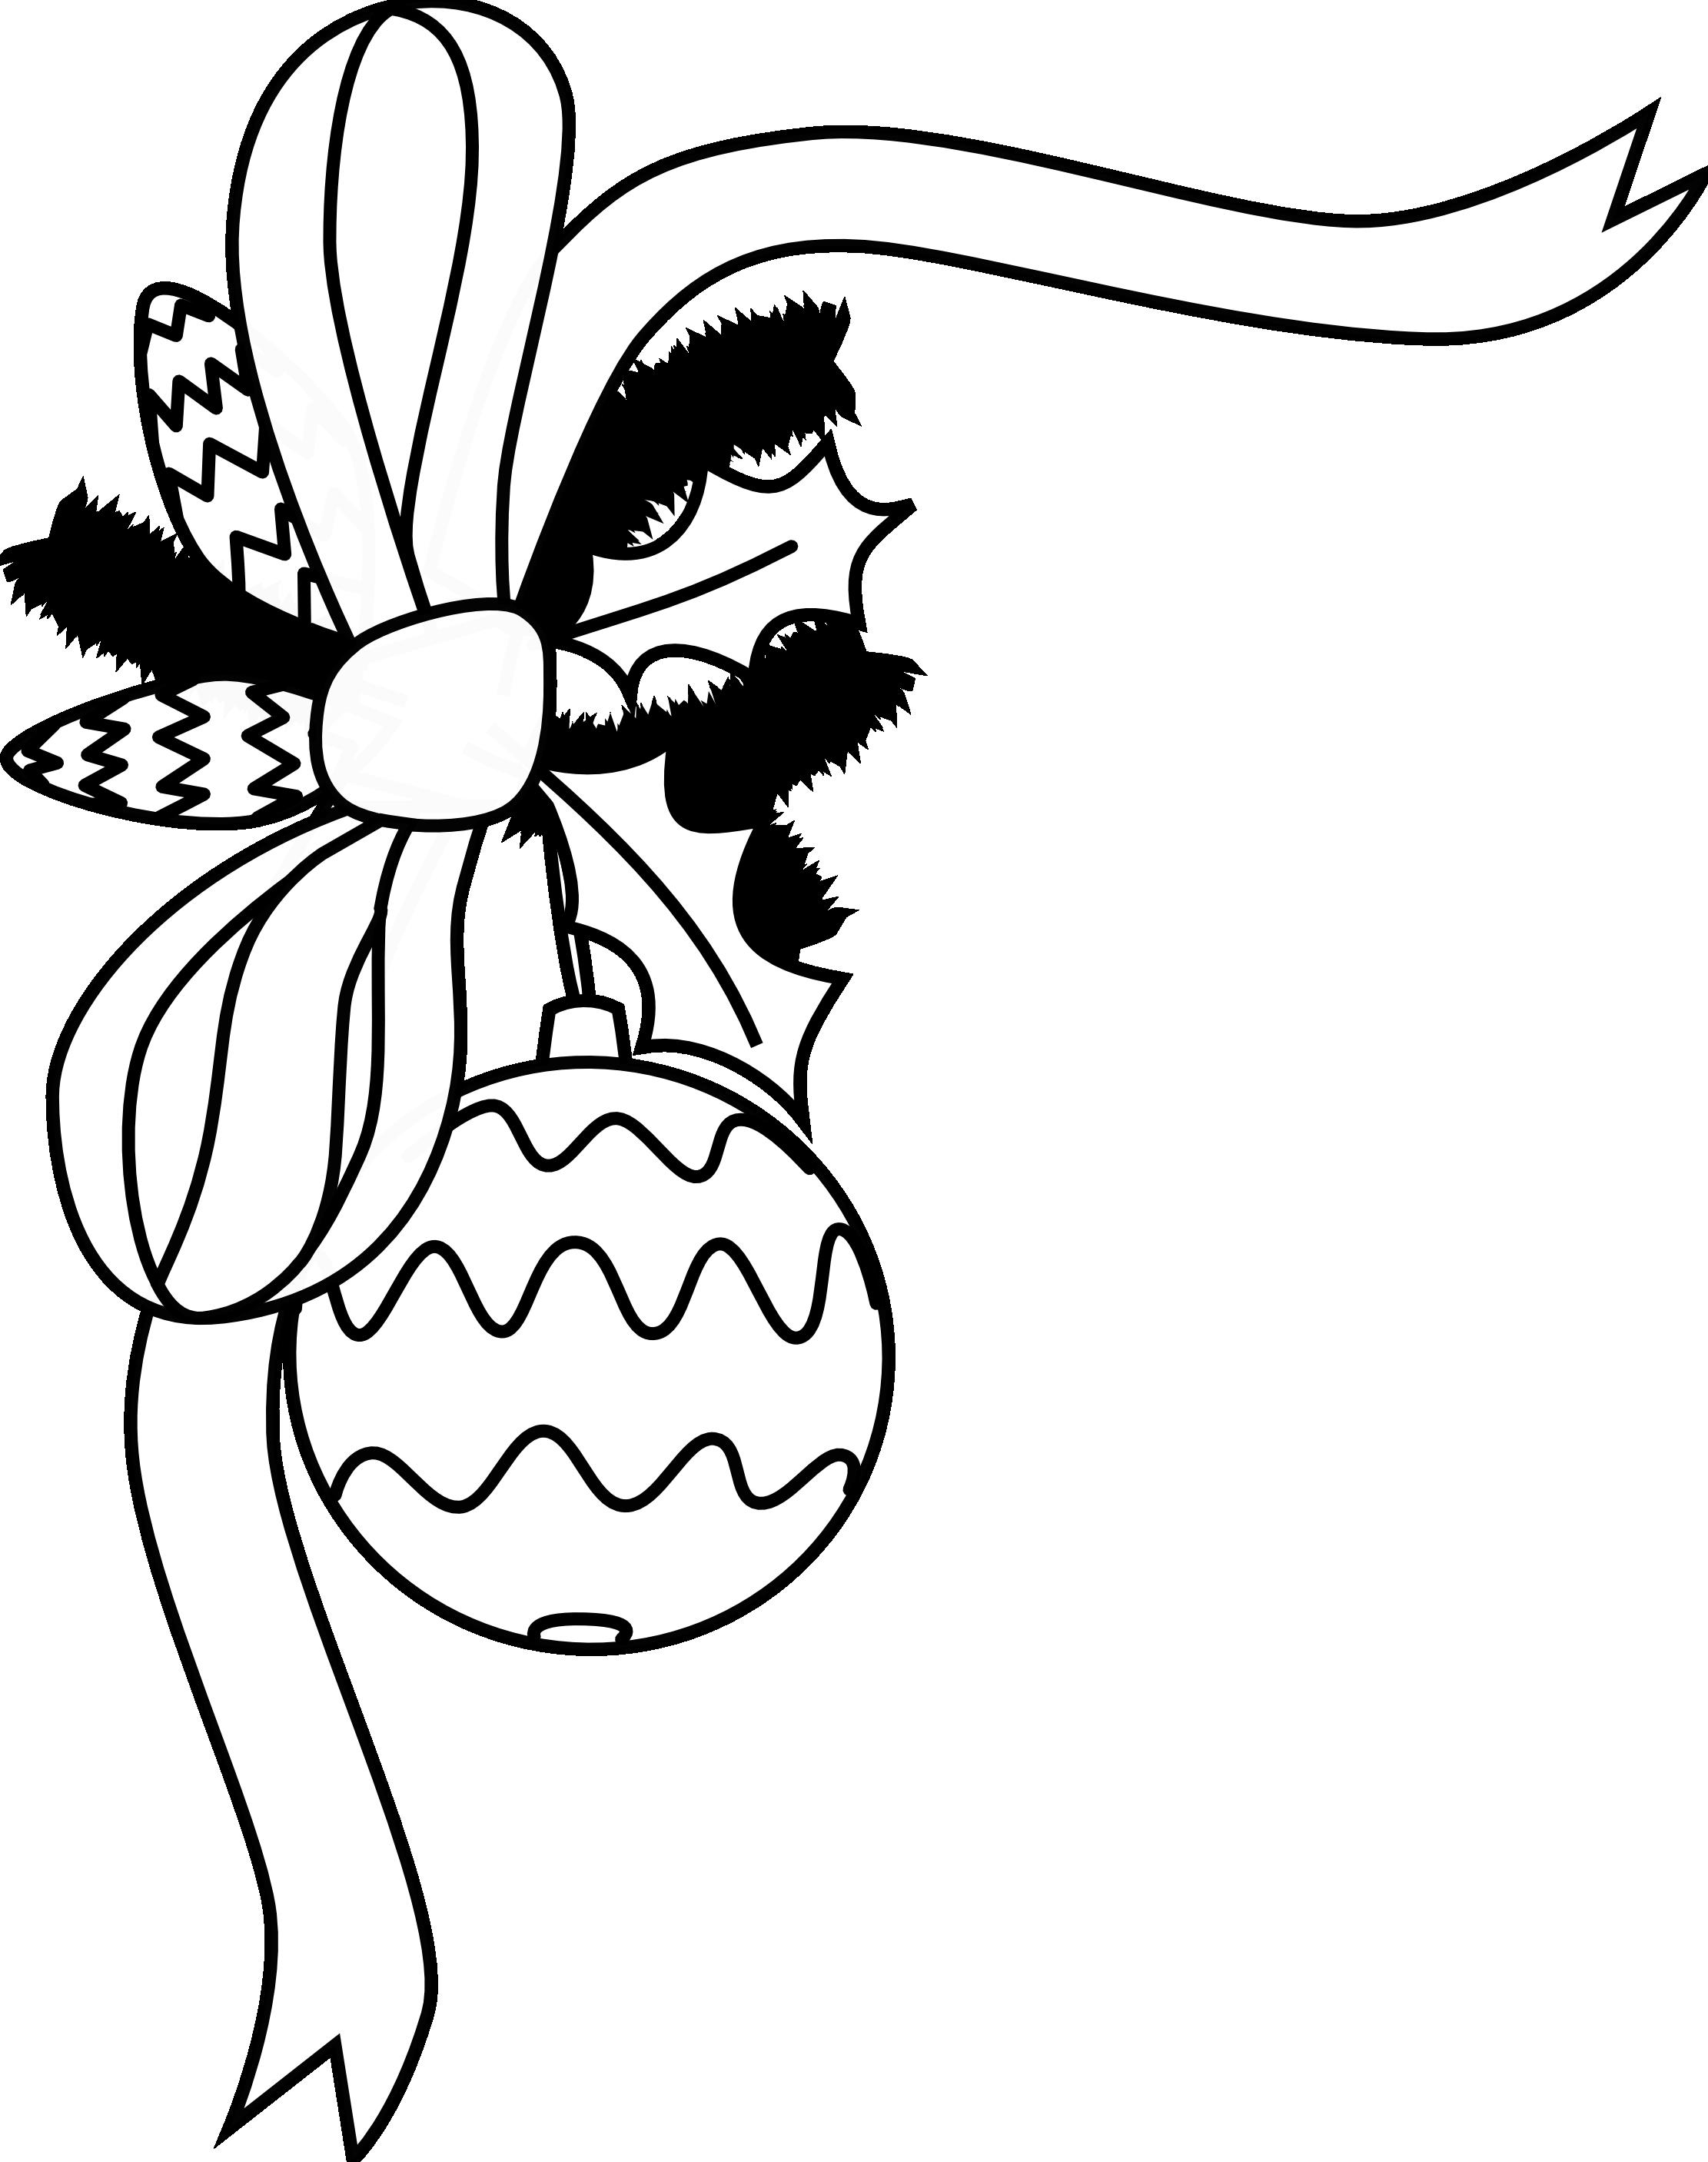 Christmas divider clipart image transparent download Religious Christmas Symbols Clip Art (58+) image transparent download